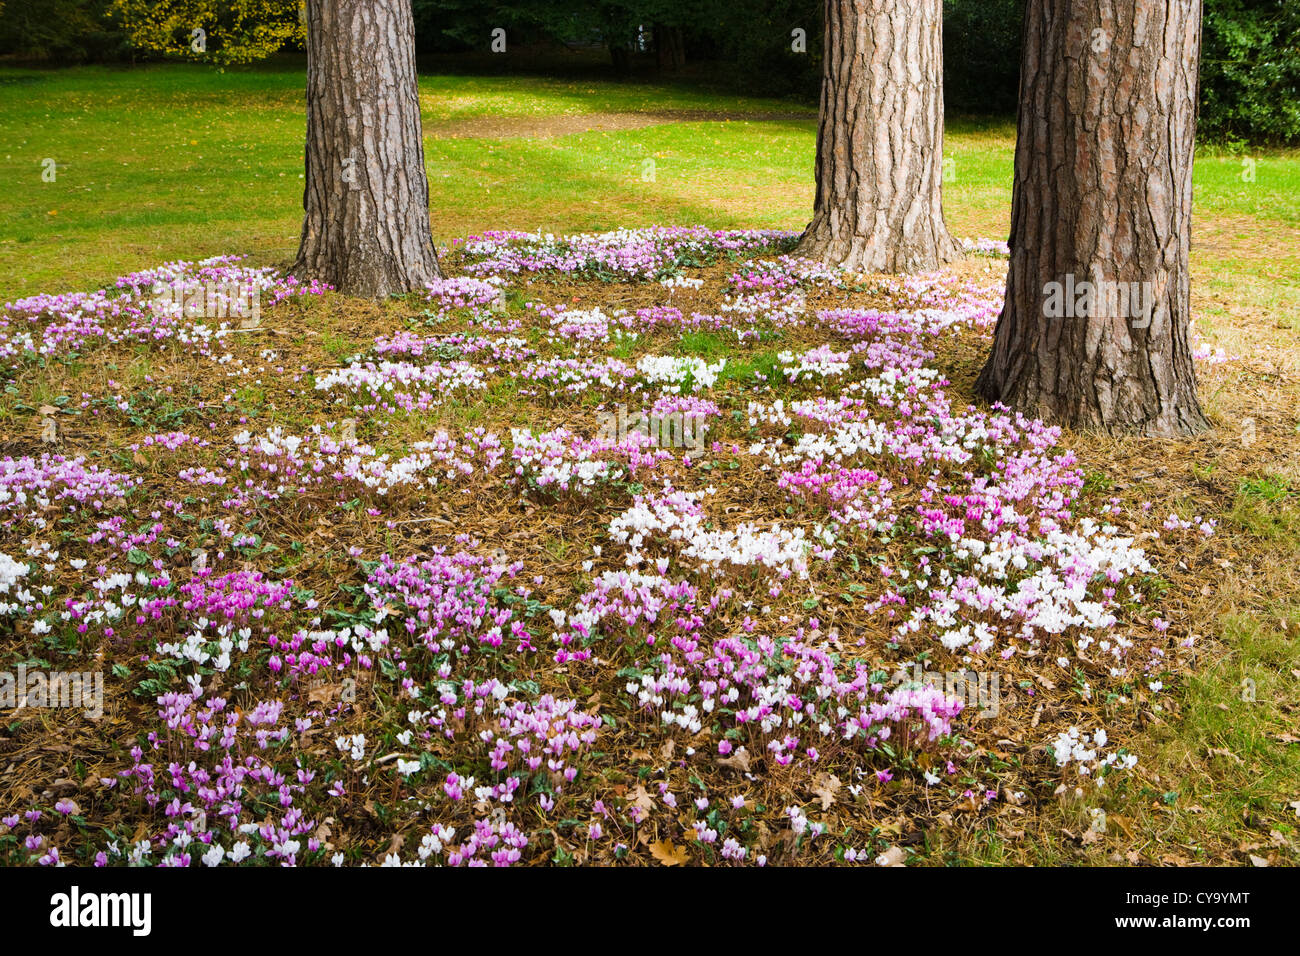 Cyclamen (autumn flowering) under pine trees. Wisley Garden, UK. - Stock Image